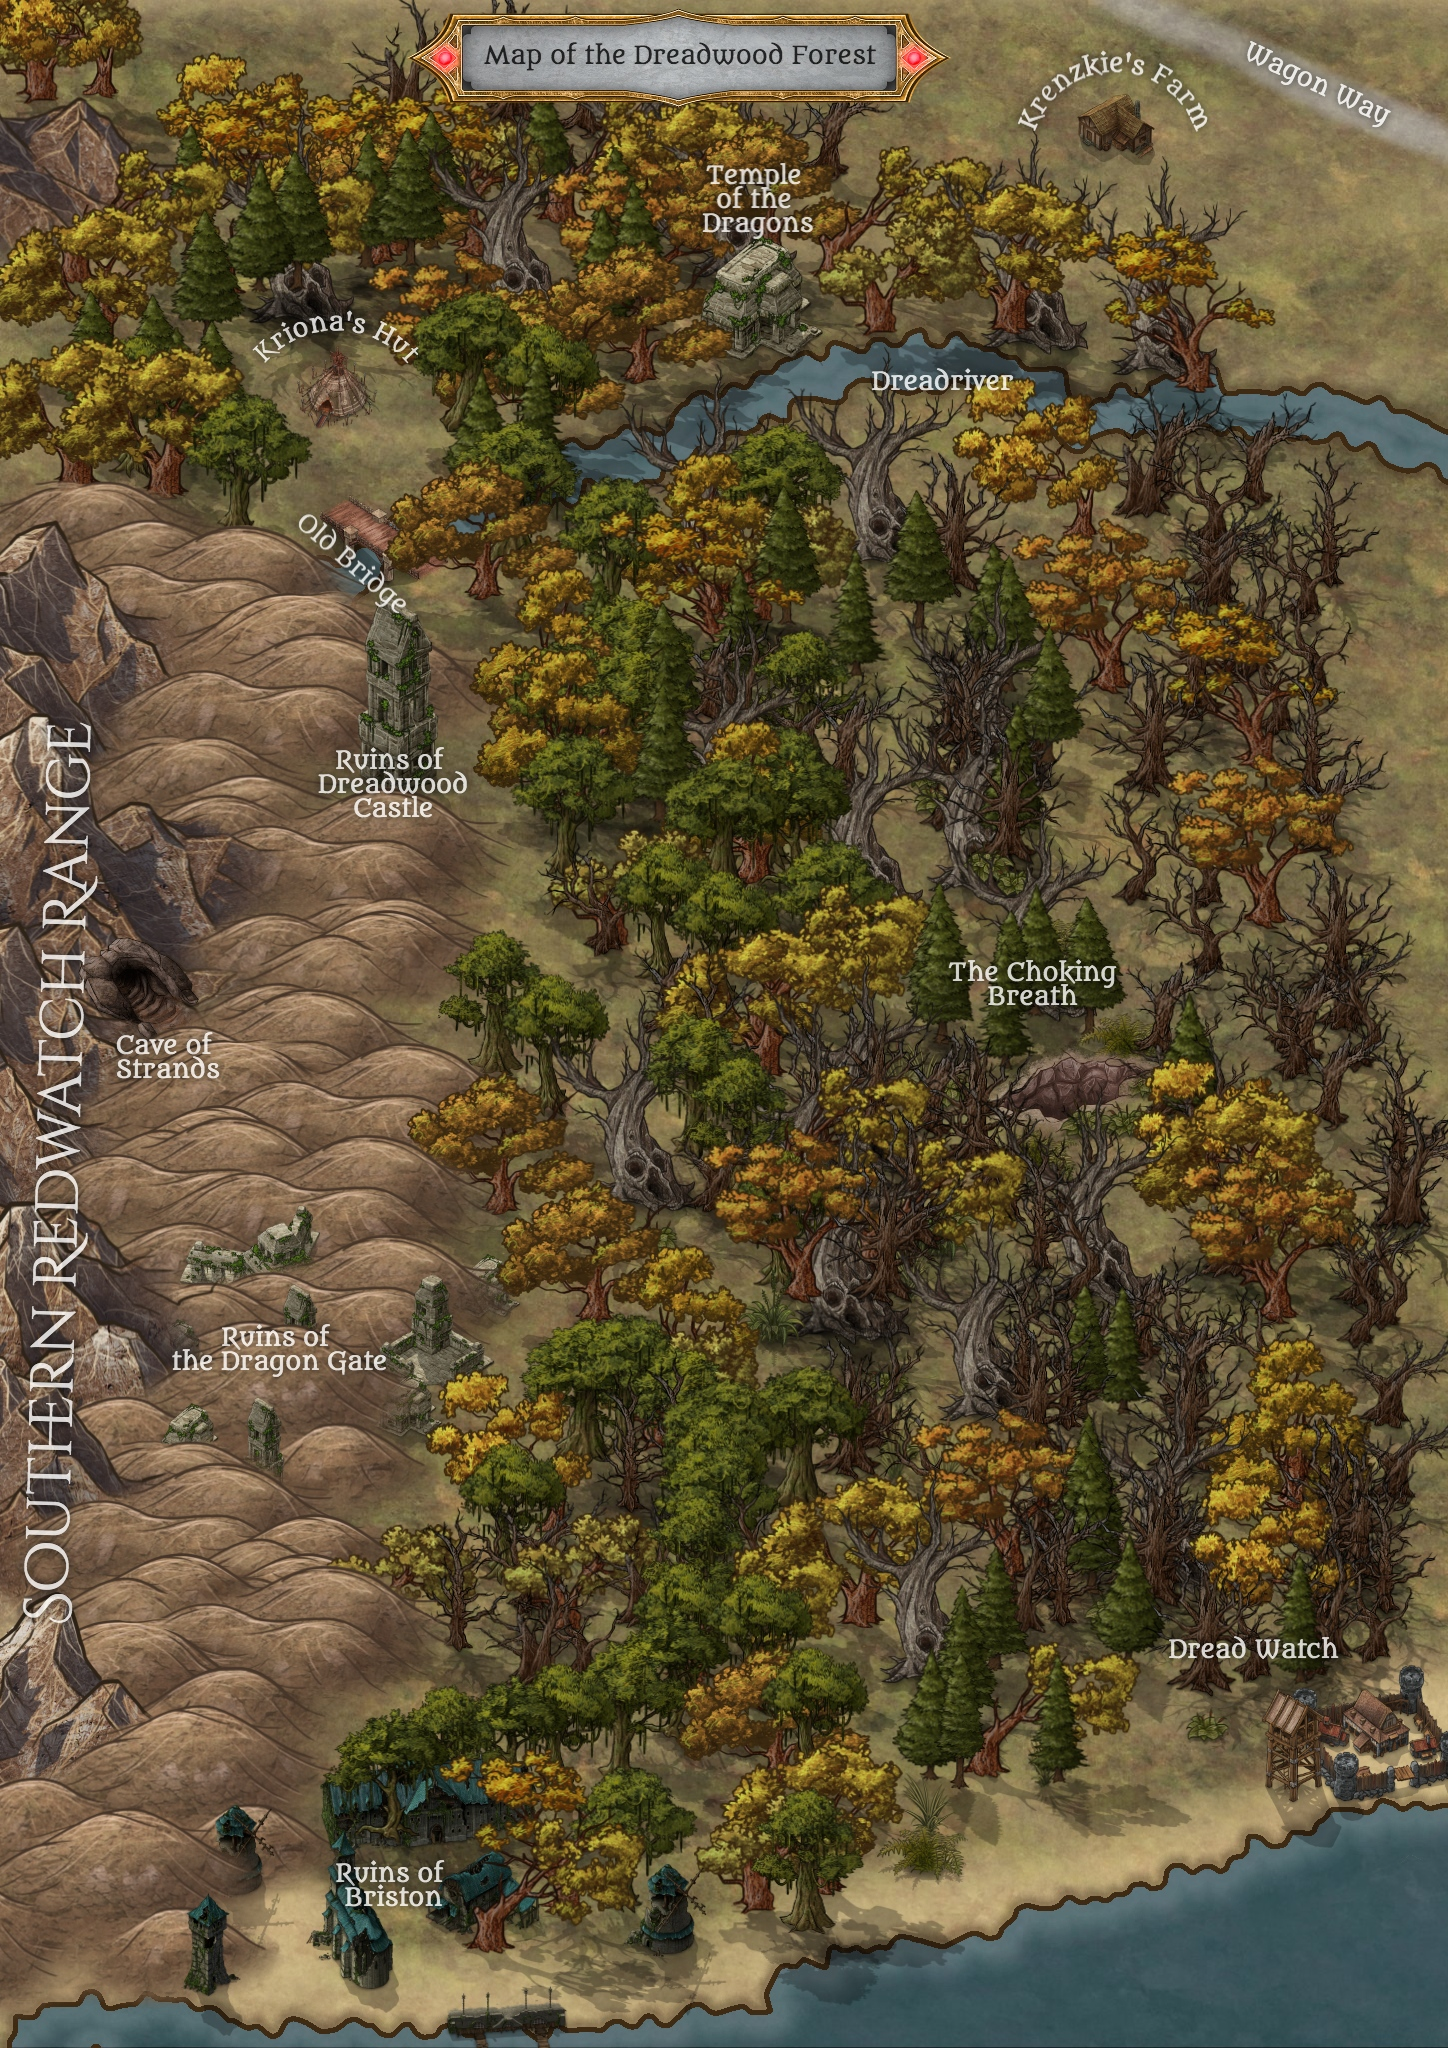 Map of Dreadwood